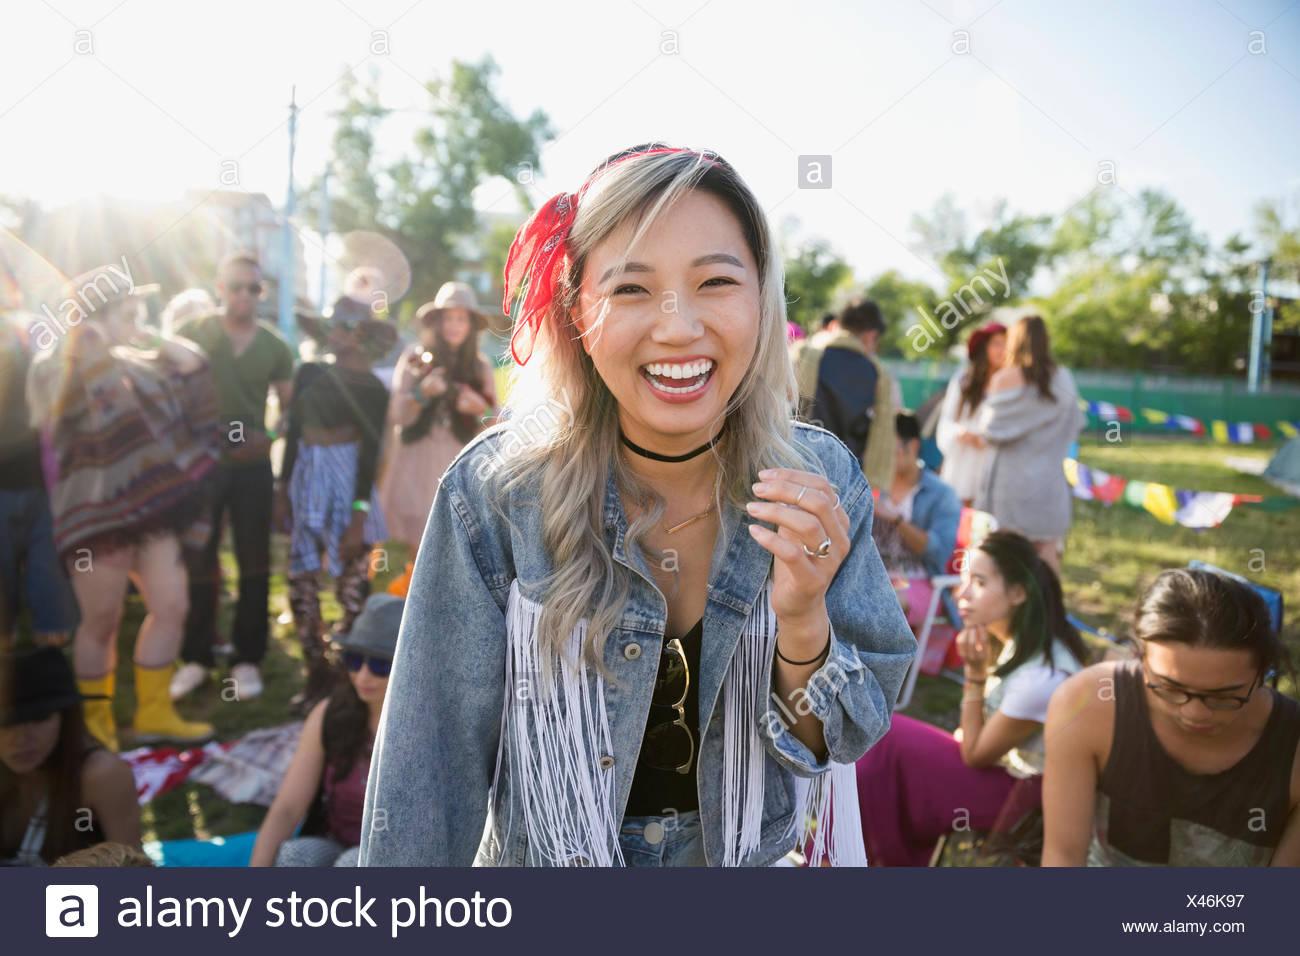 Porträt lachender Junge Frau am Sommer-Musik-Festival-Campingplatz Stockbild